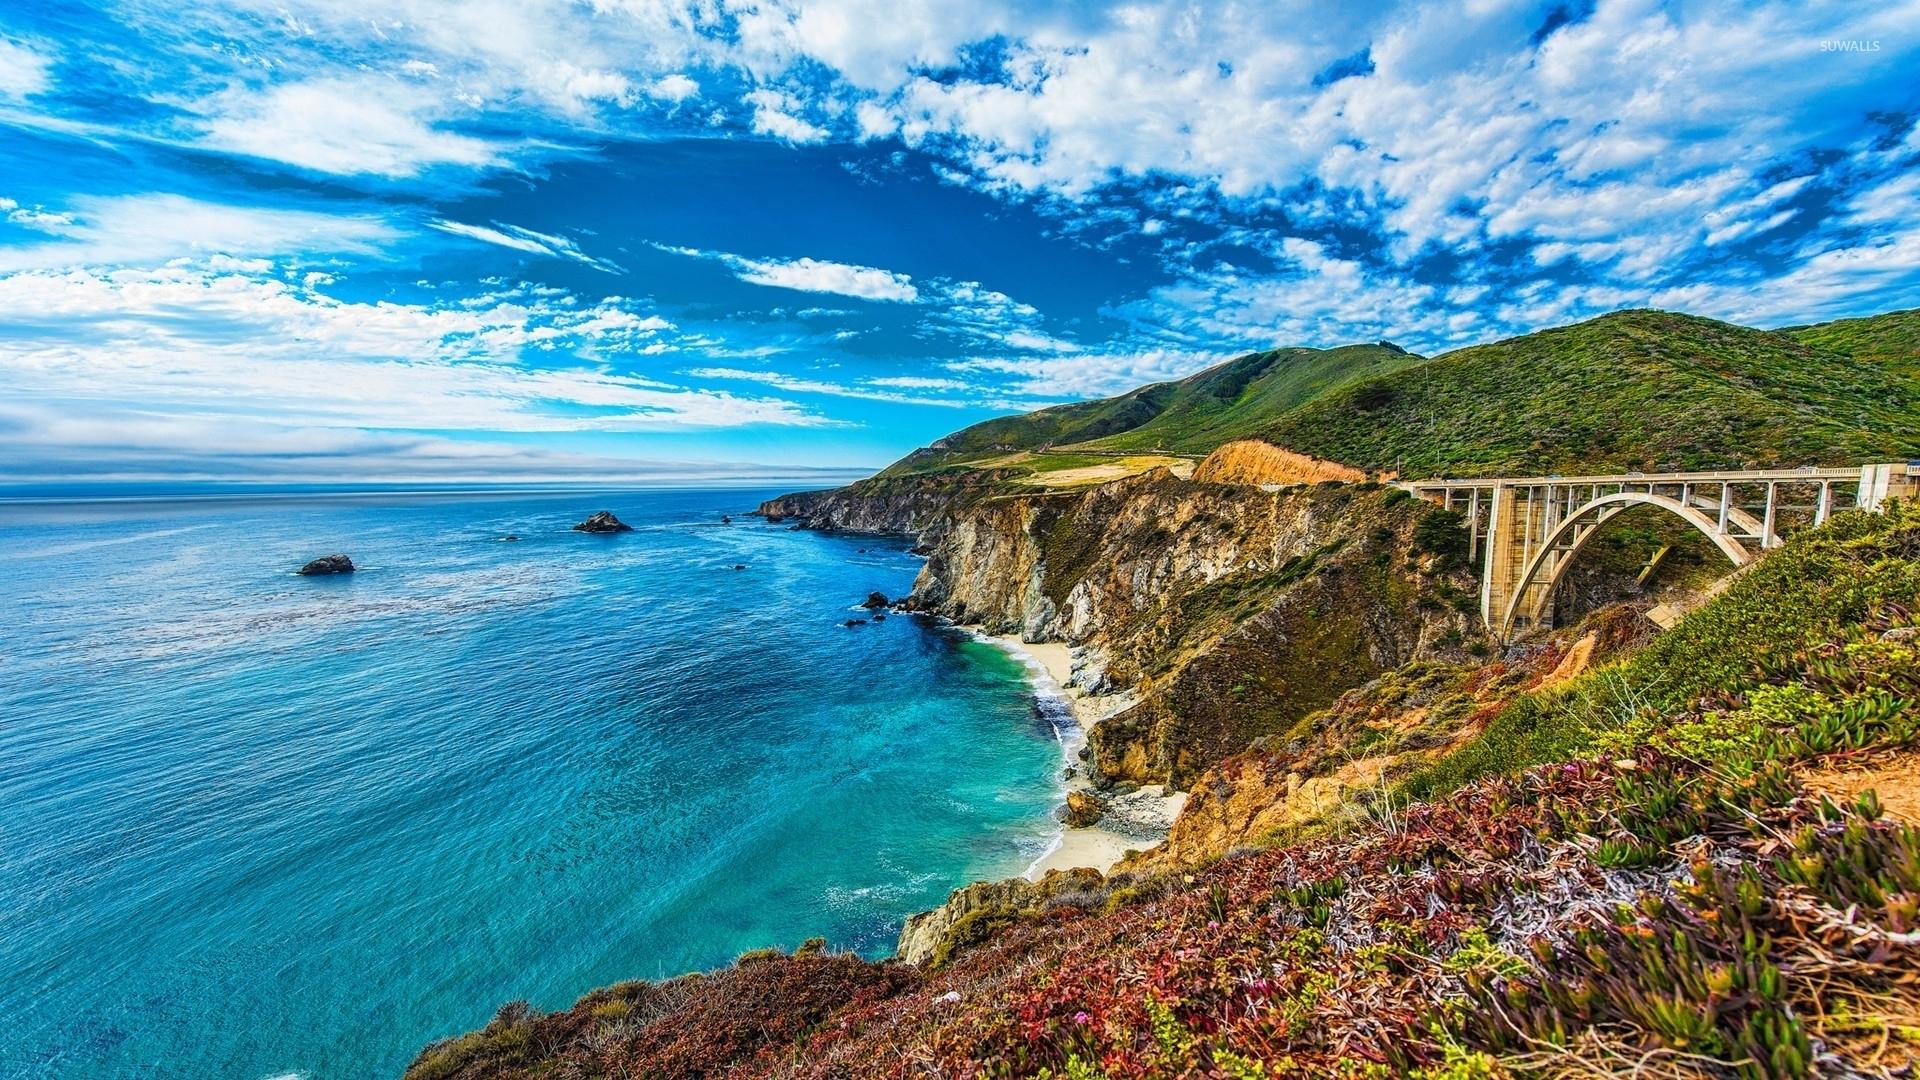 Bixby Creek Bridge Big Sur California 4K Desktop Wallpaper